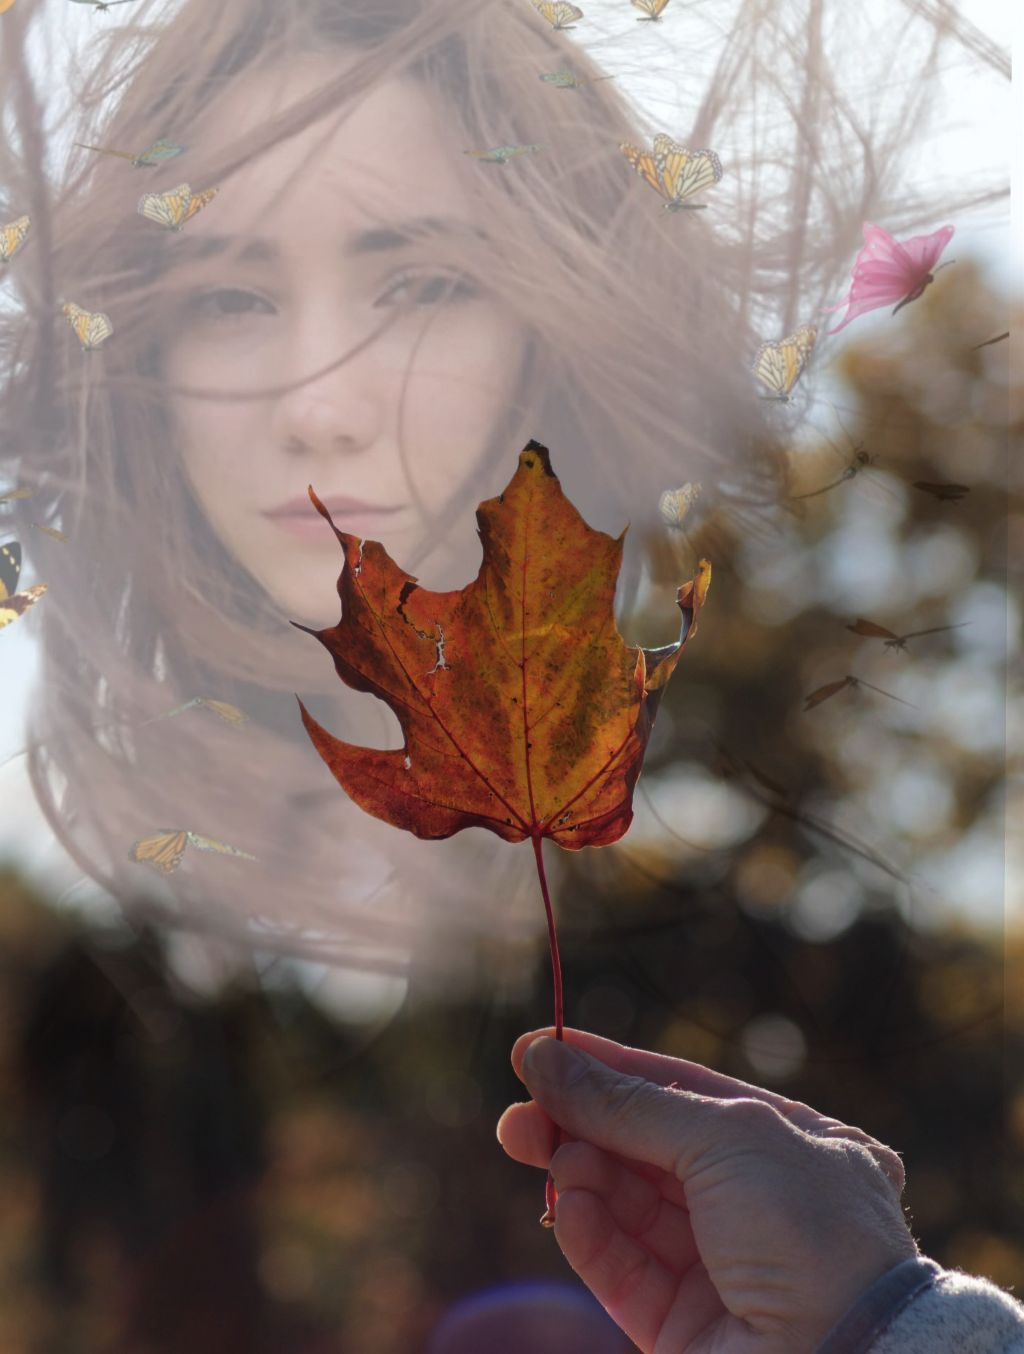 #nochallenge #doubleexsposure #freetoedit #autumnleaf